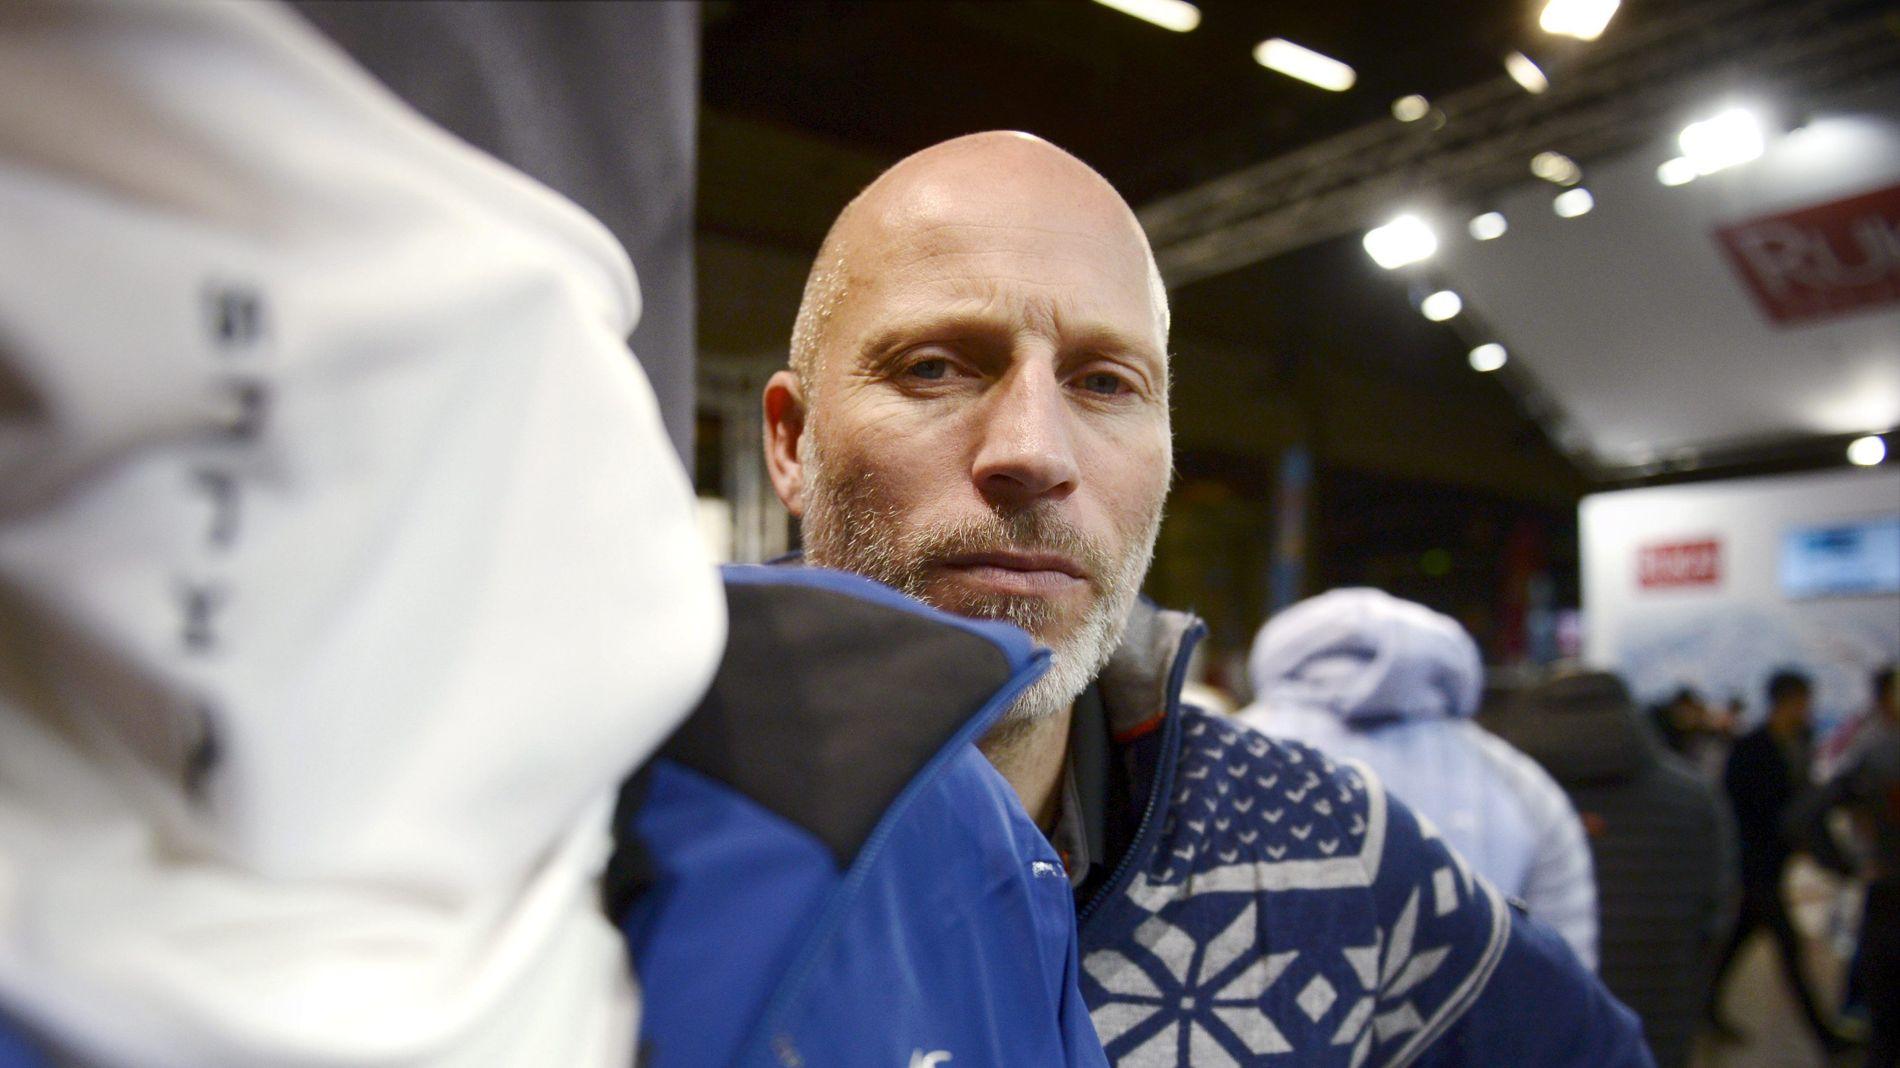 KJUS SOLGT TIL AMERIKANSK GIGANT: Her poserer den tidligere alpinstjernen Lasse Kjus foran et produkt fra merket hans, Kjus.